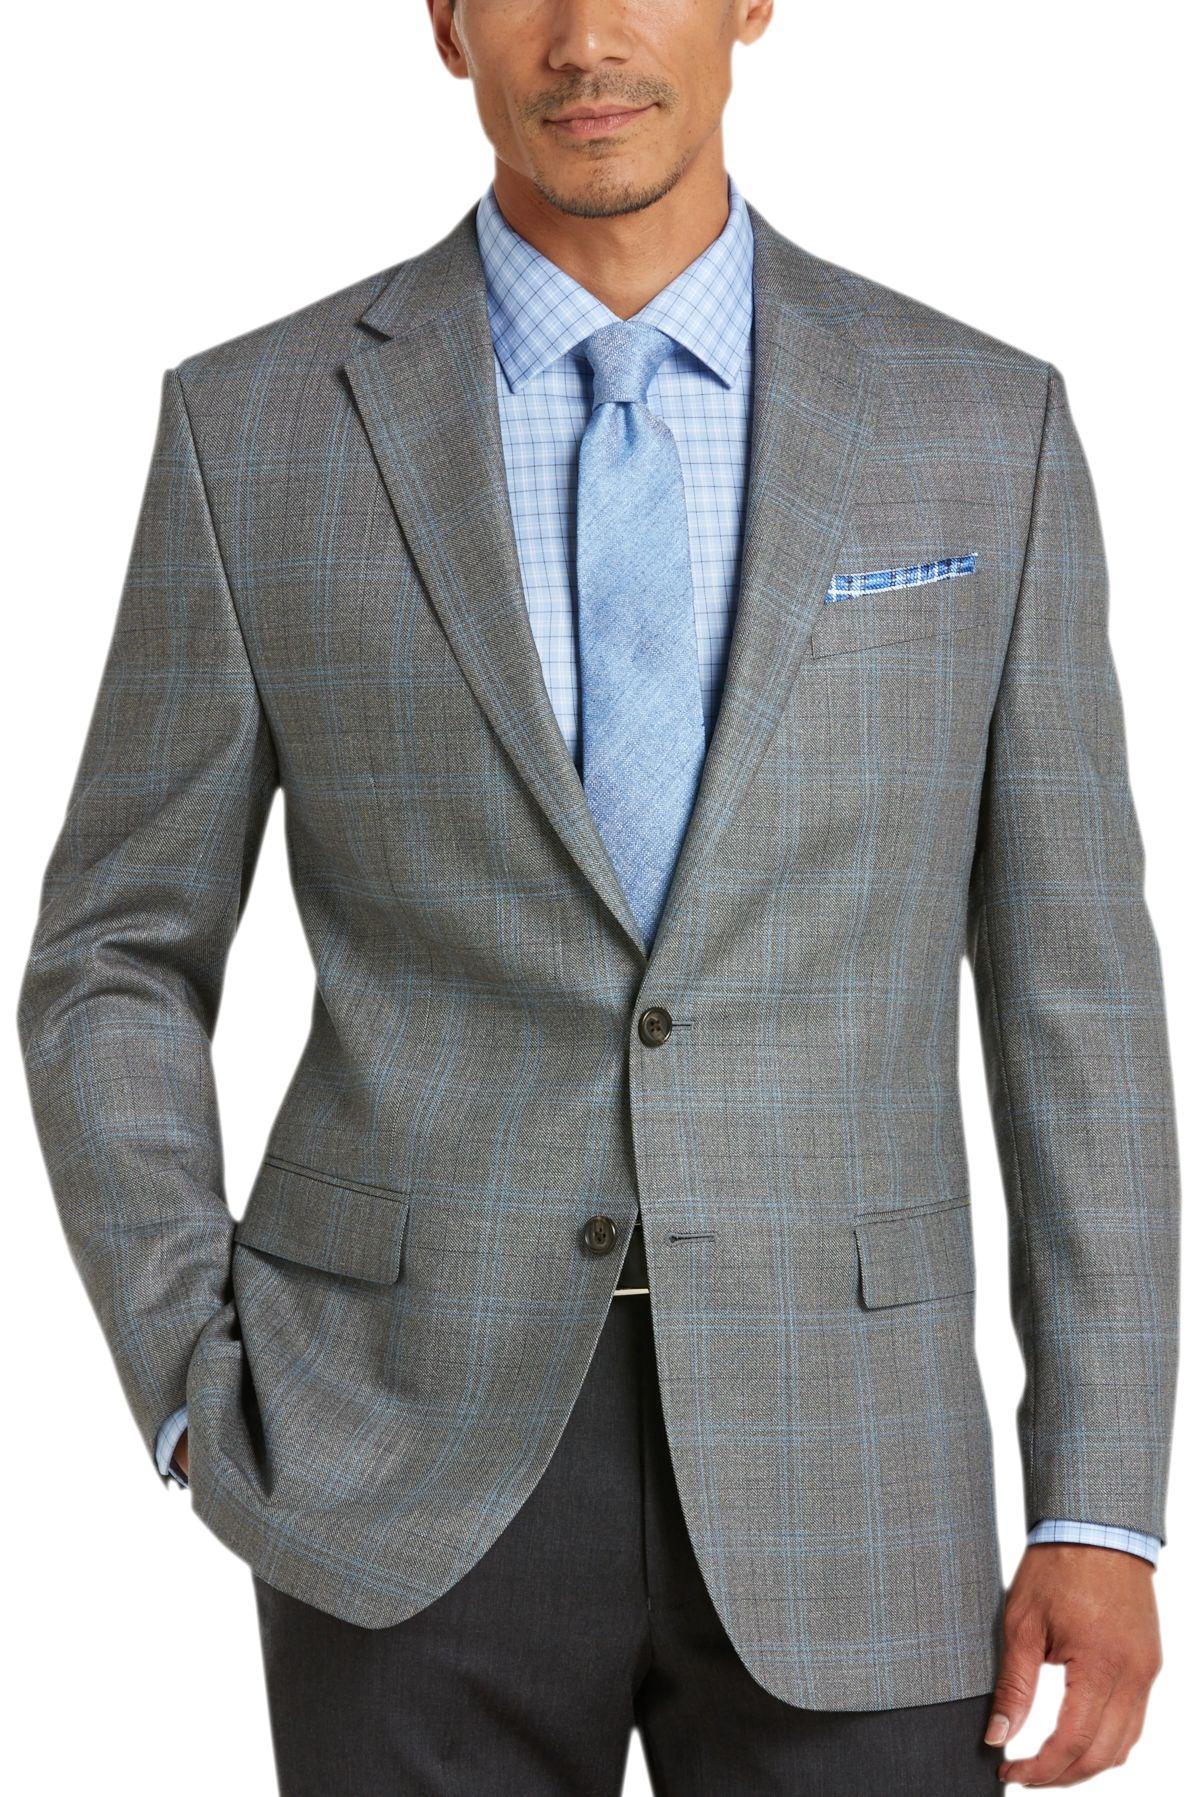 Sport Coats Cleareance - Shop Closeout Sport Jackets | Men's Wearhouse